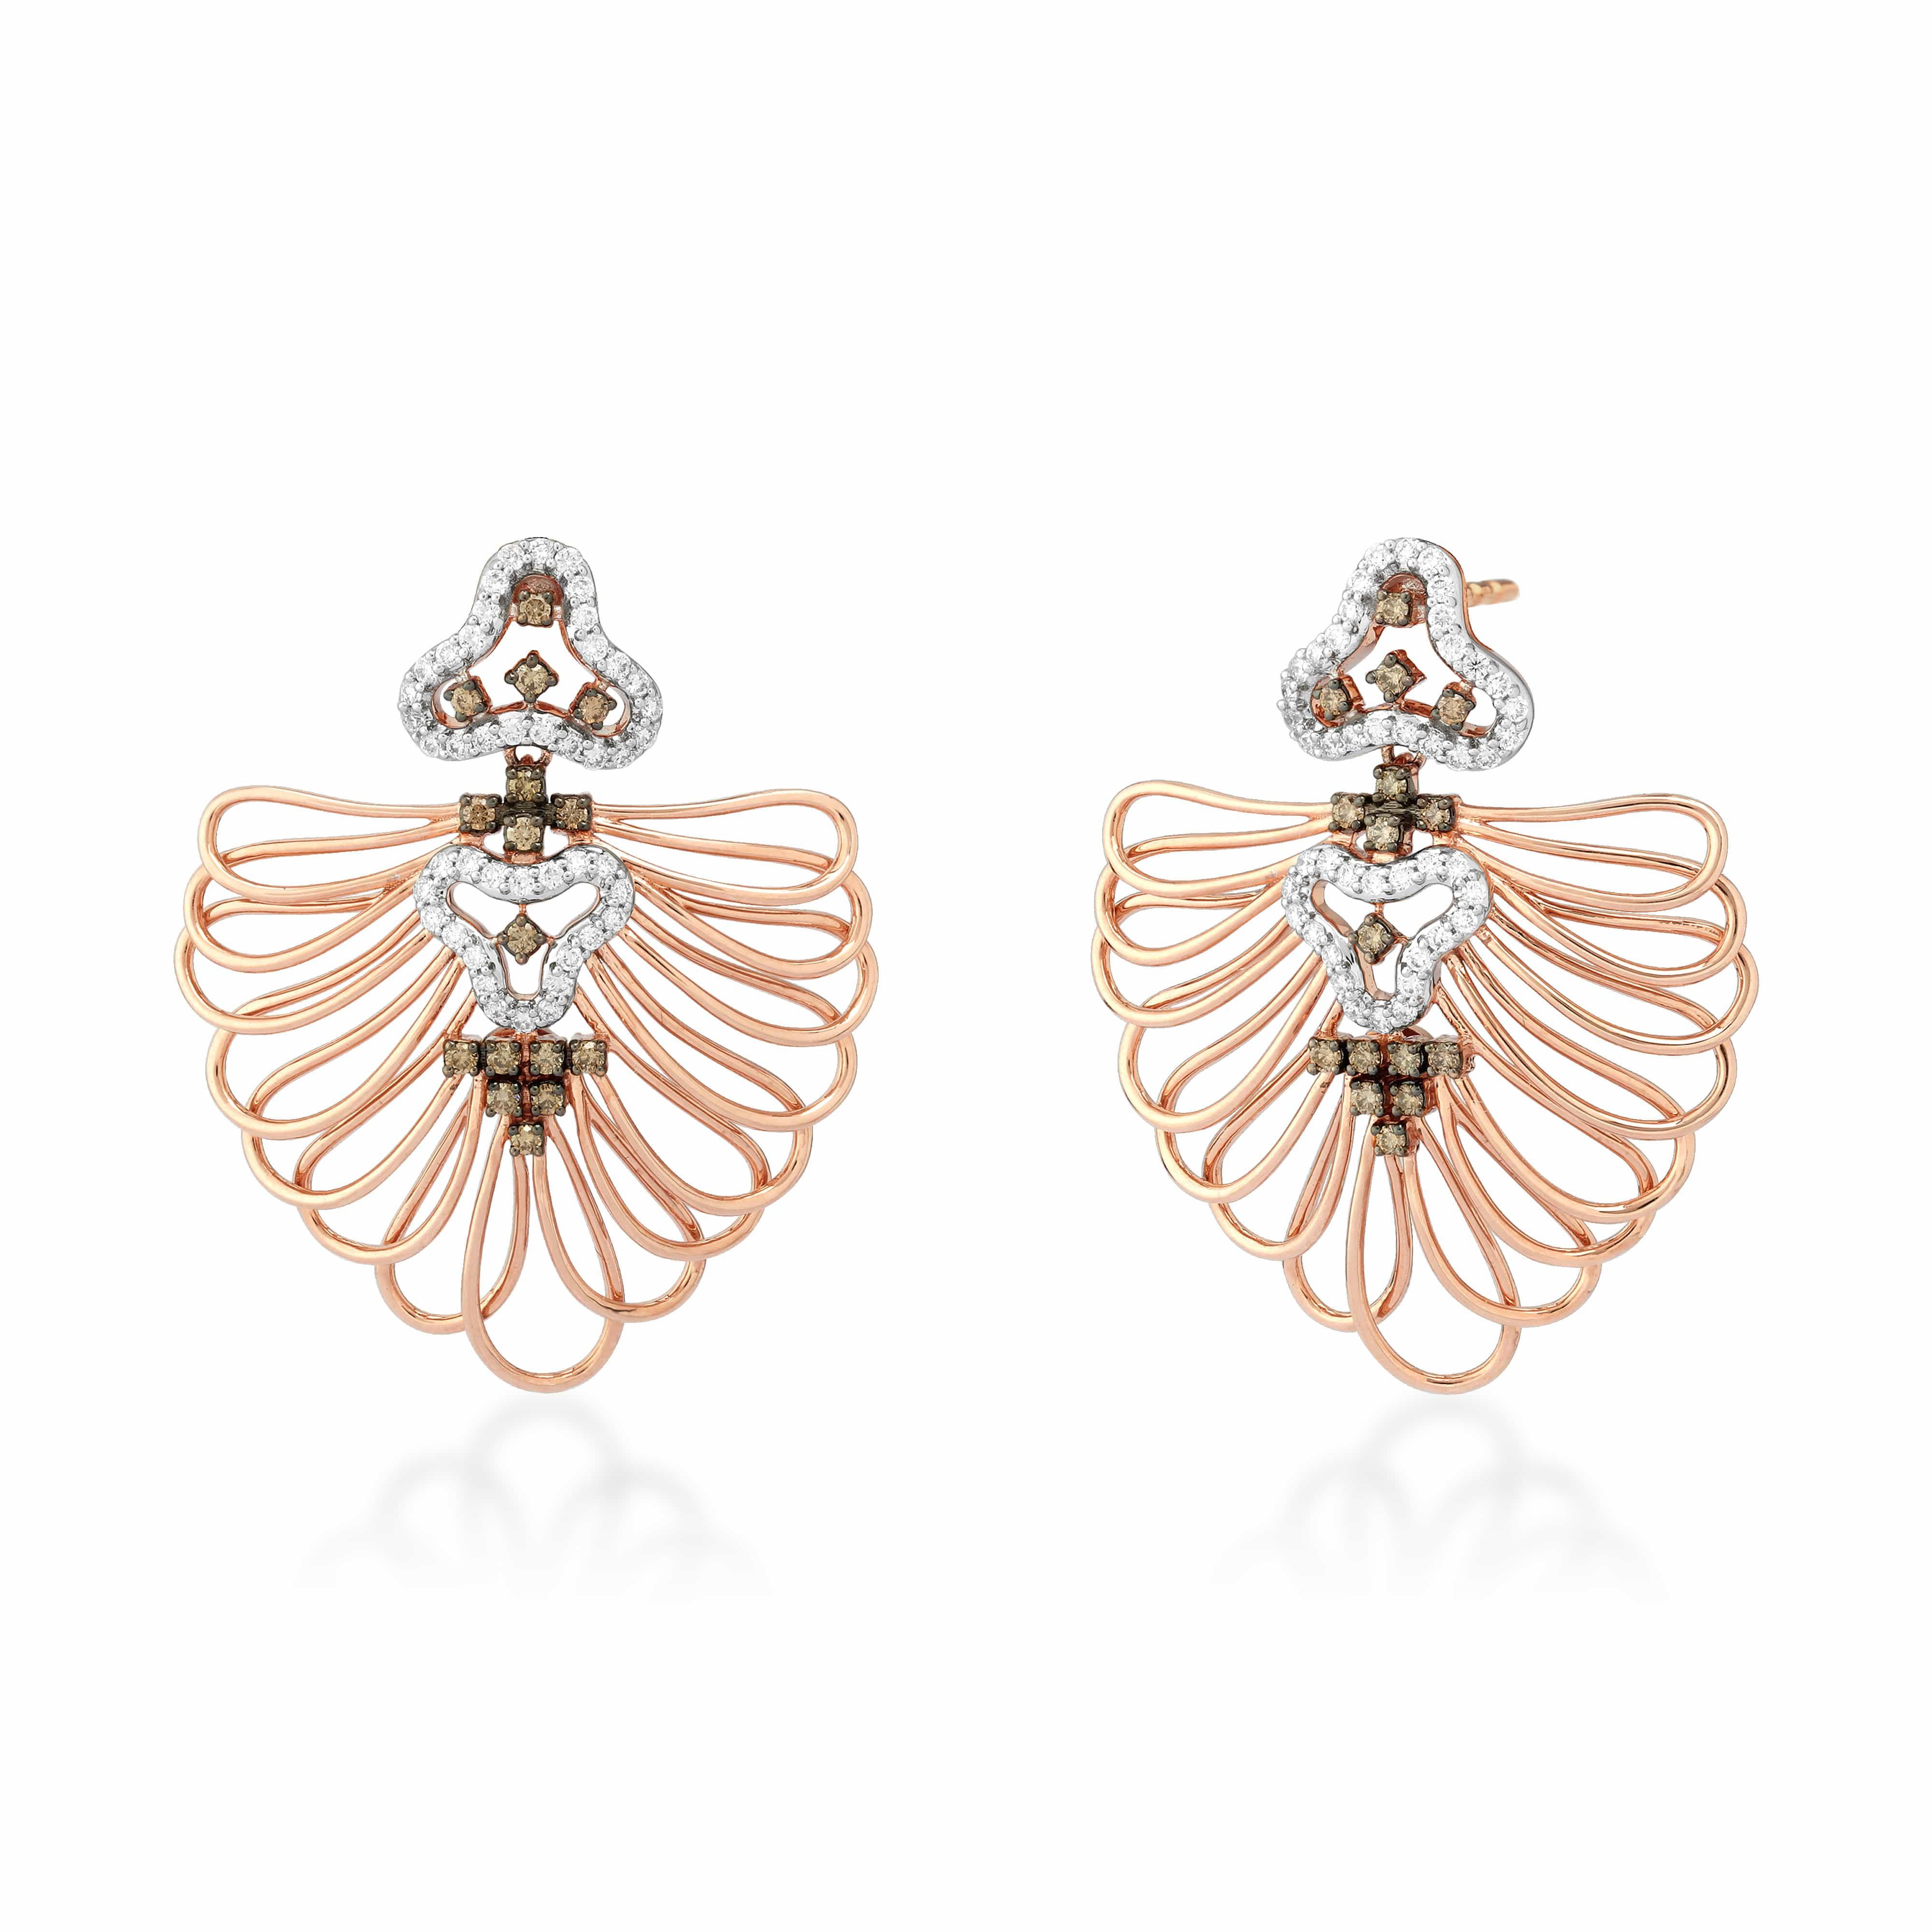 starring_you_twined__earrings